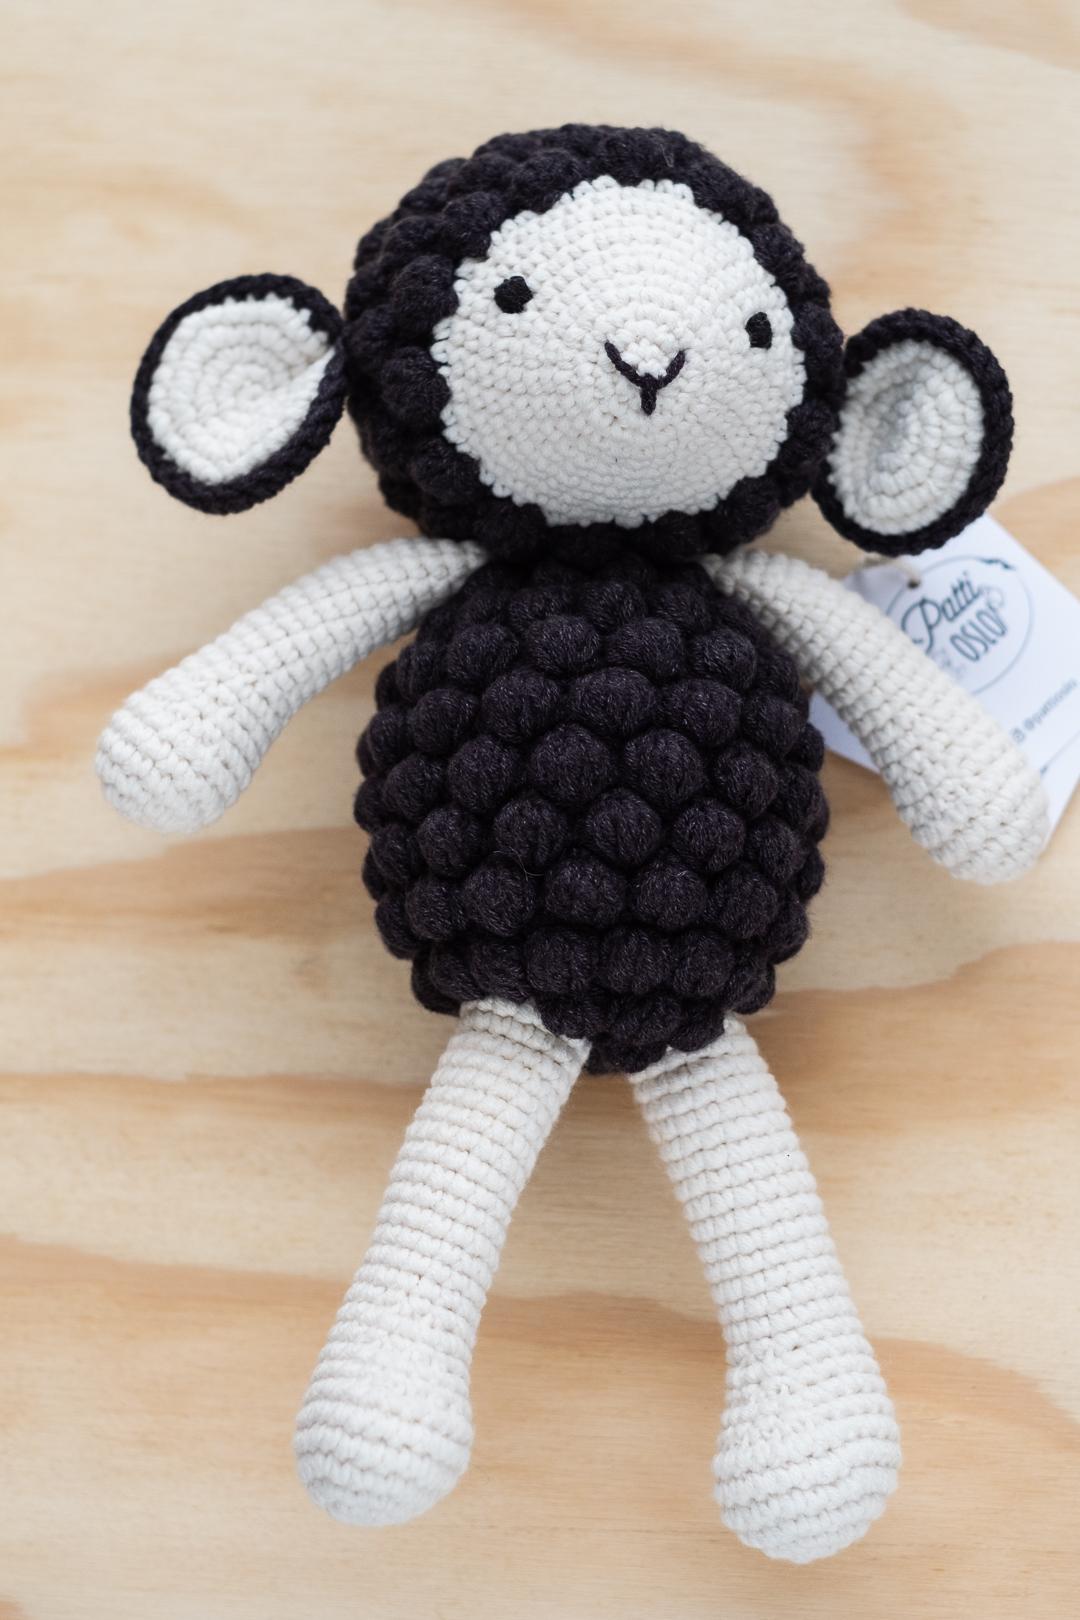 Patti Oslo - Sheep